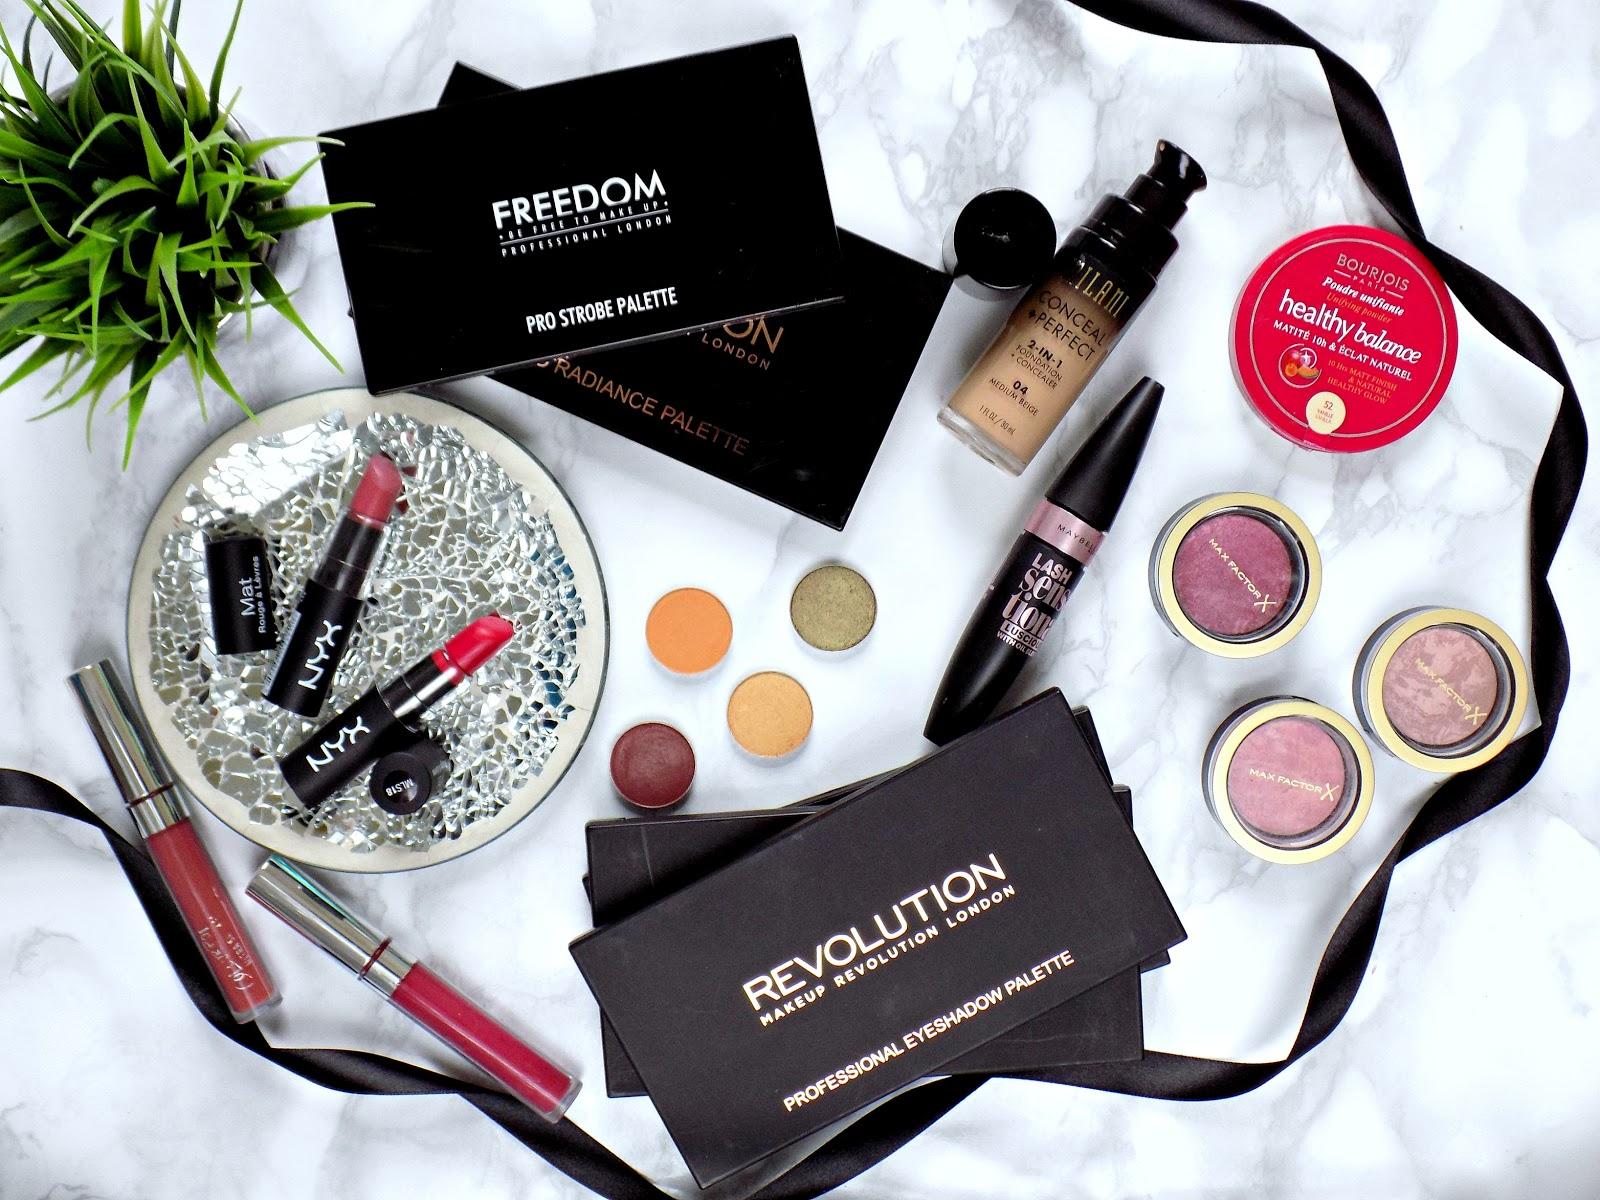 10 fantastic makeup products under £10